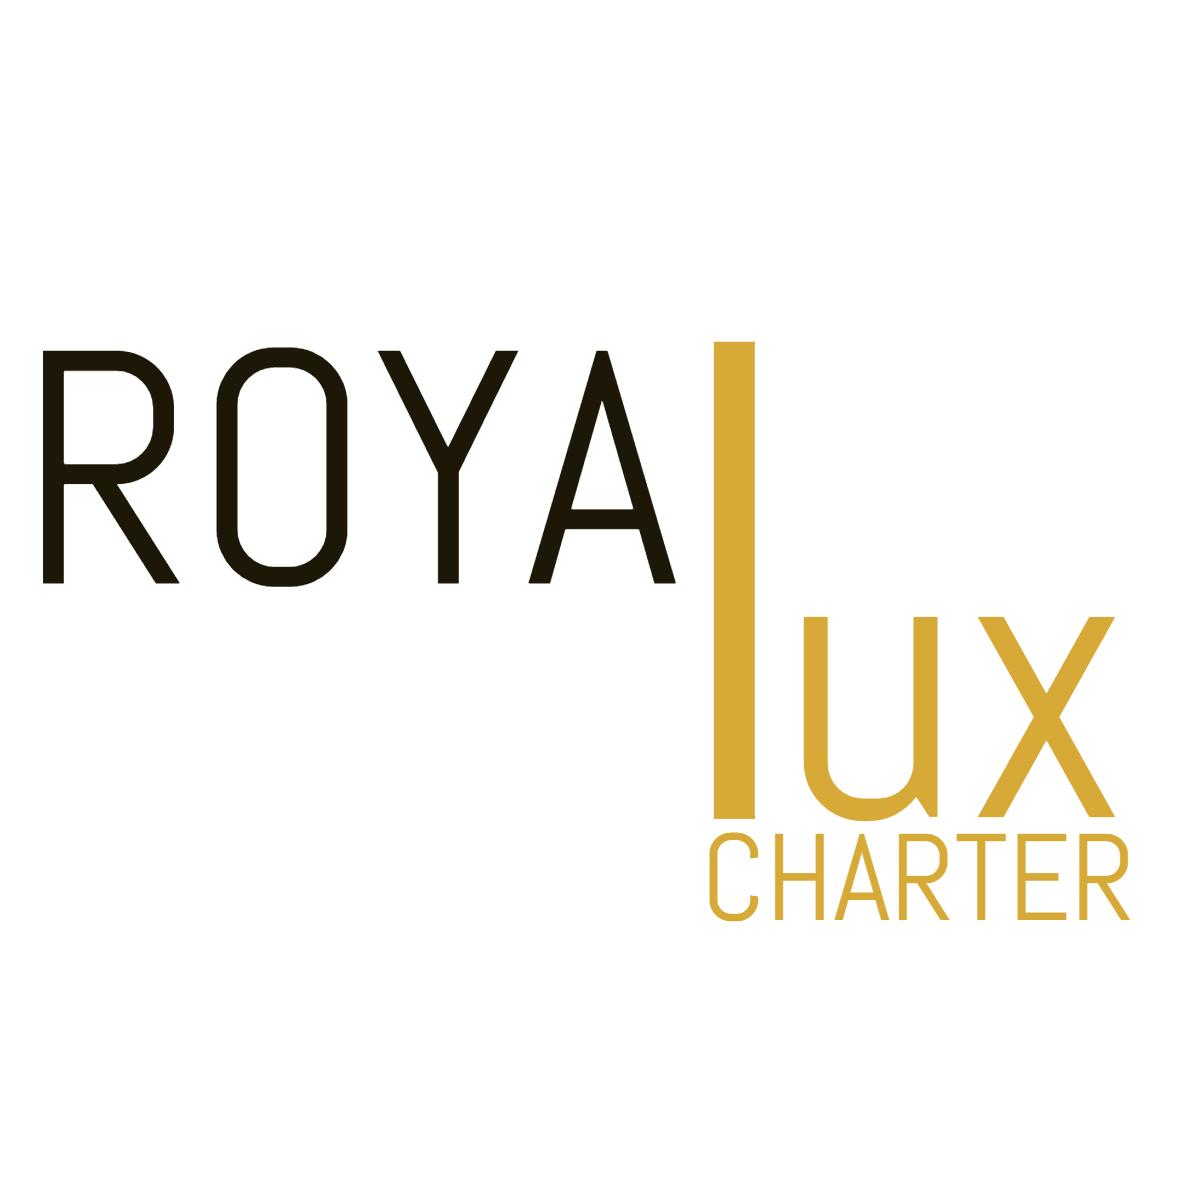 Royalux Charter Inc